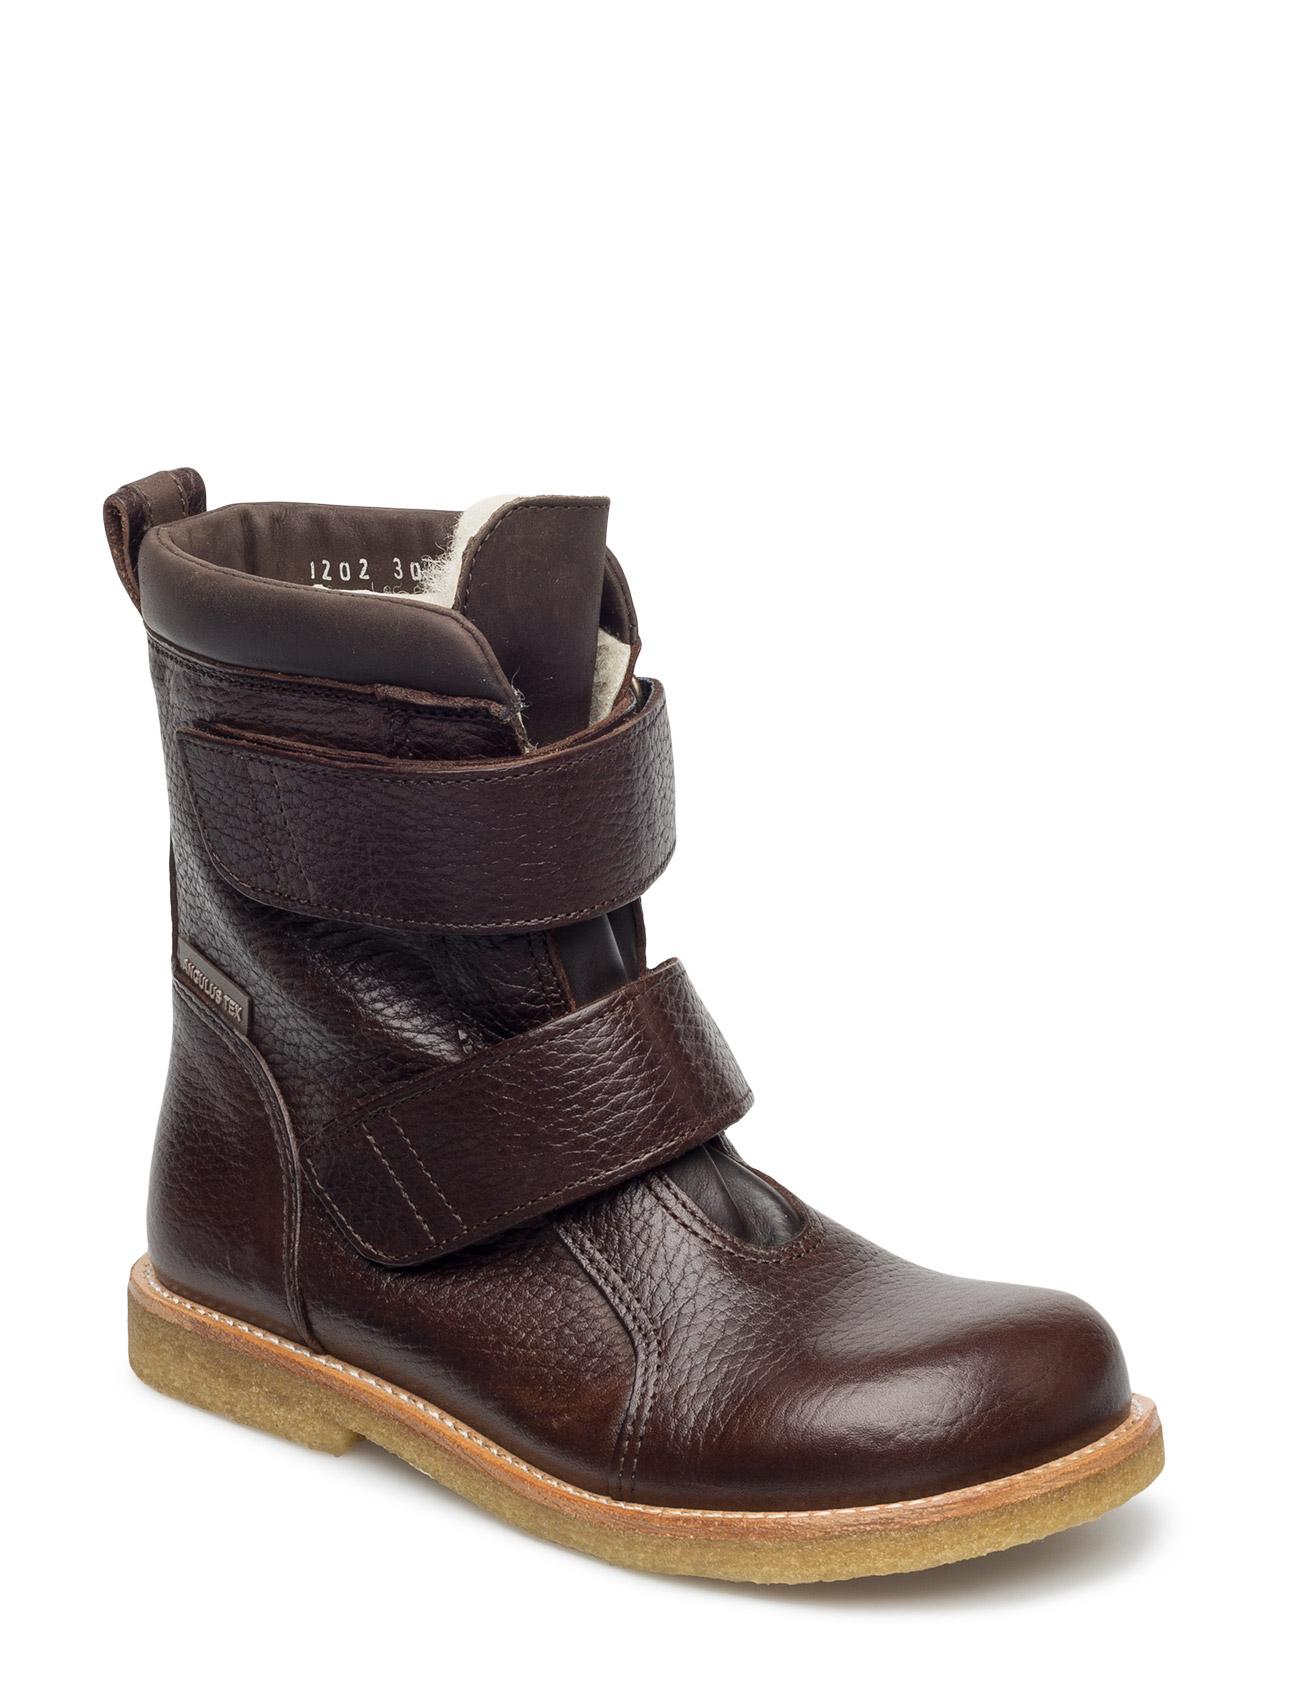 1202 ANGULUS Støvler til Børn i Mørkebrun